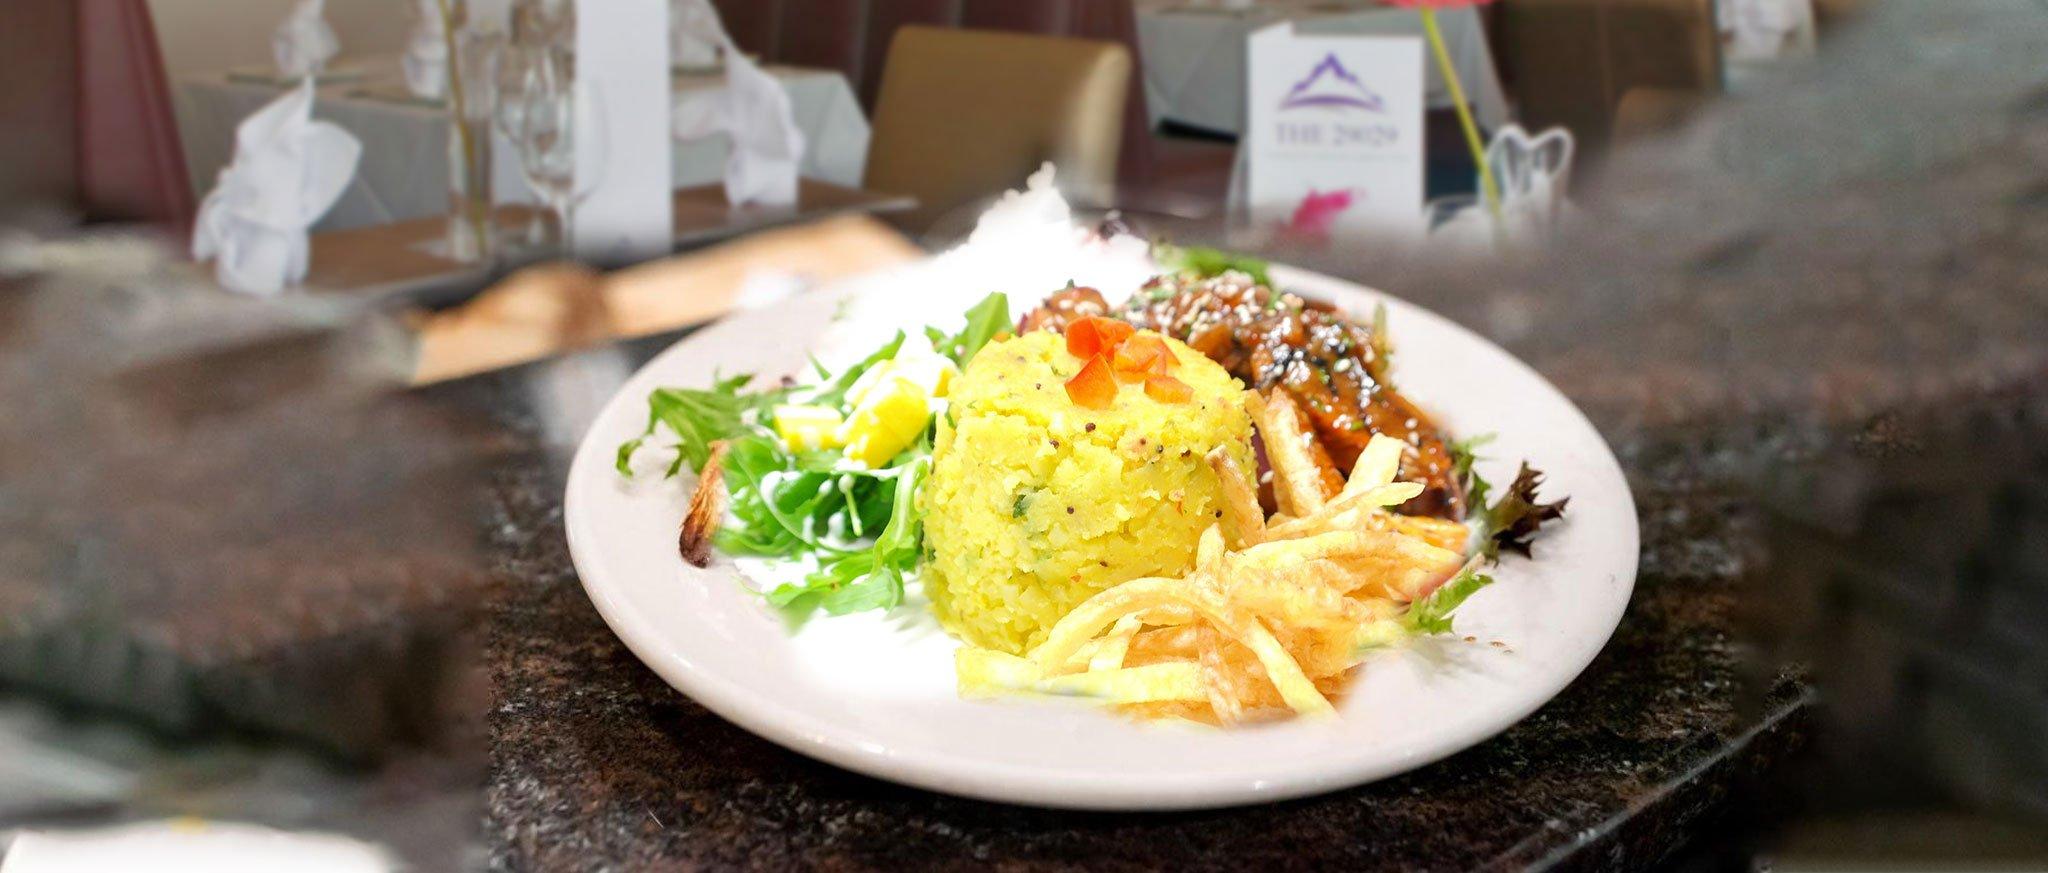 food-pic - The 29029 Restaurant Wareham UK